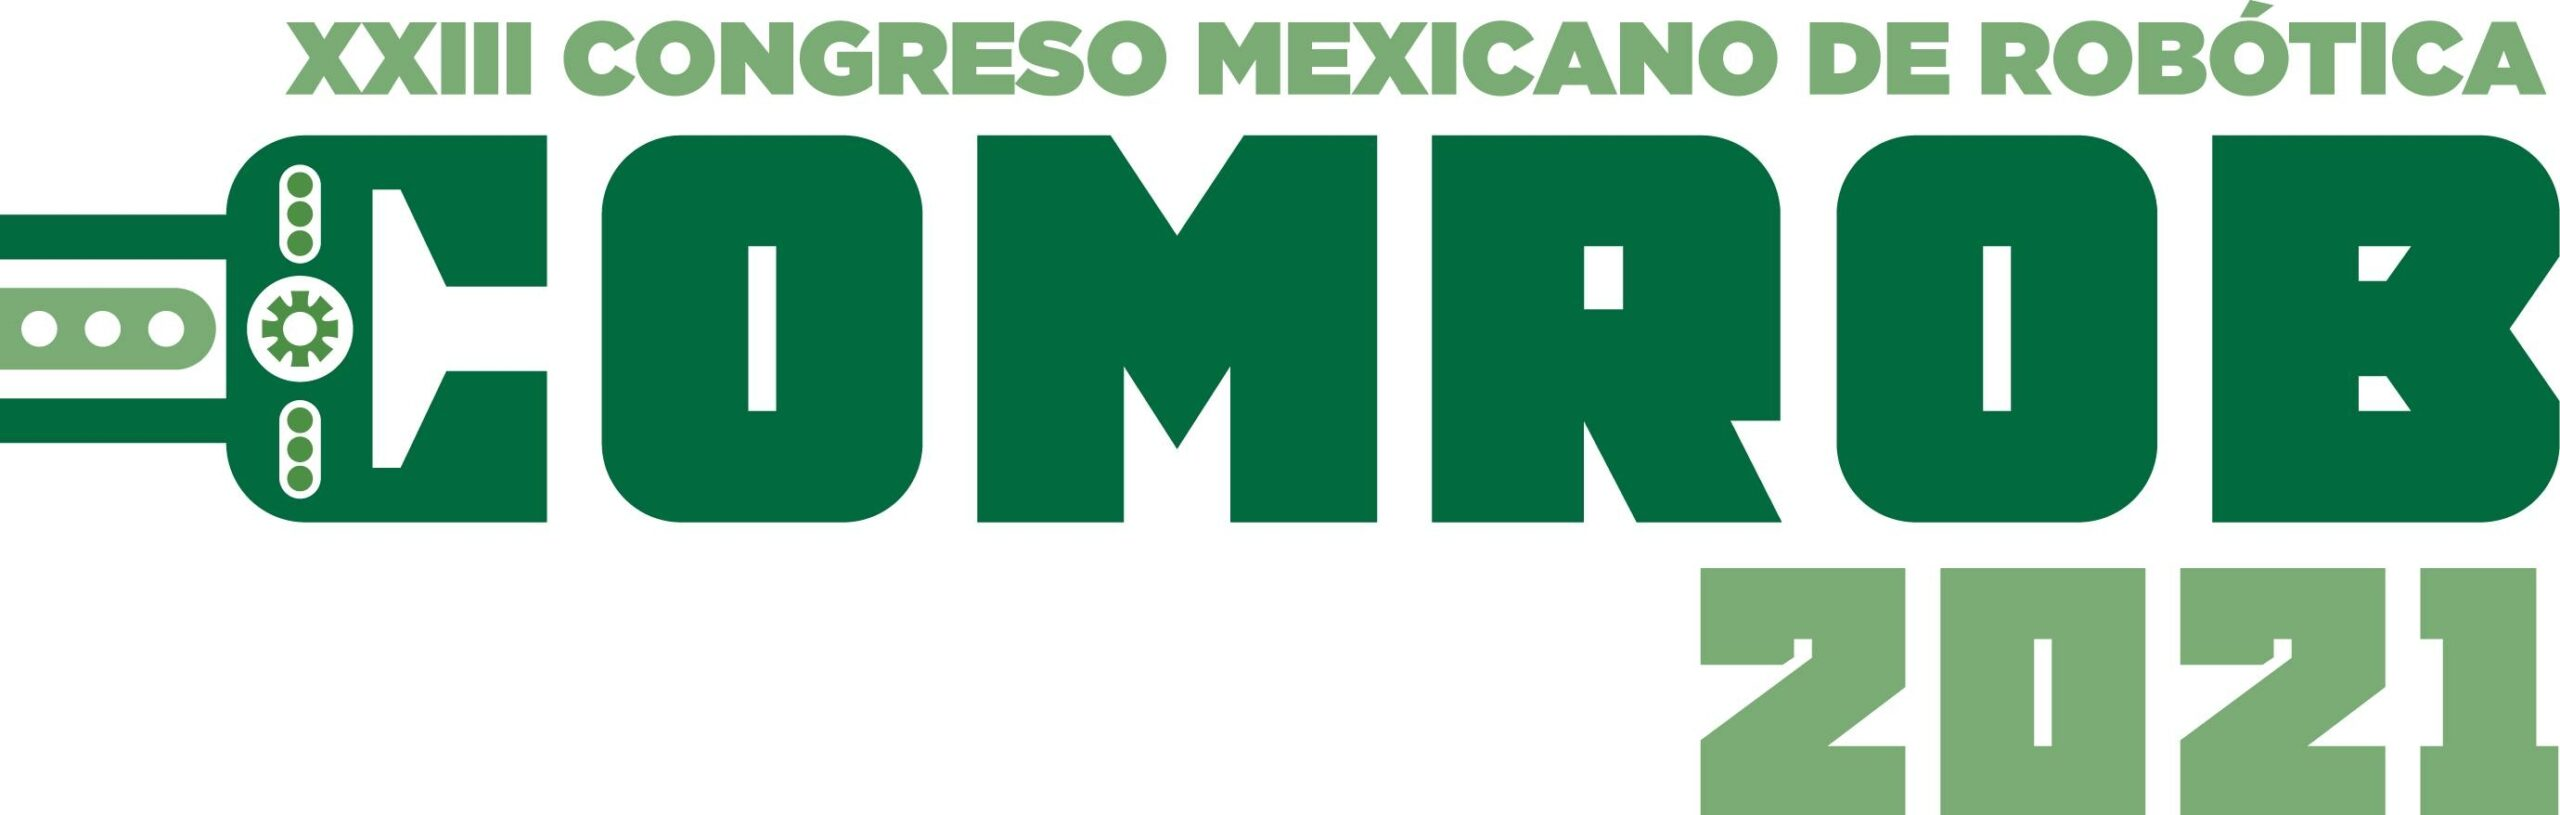 Congreso Mexicano Robótica 2021